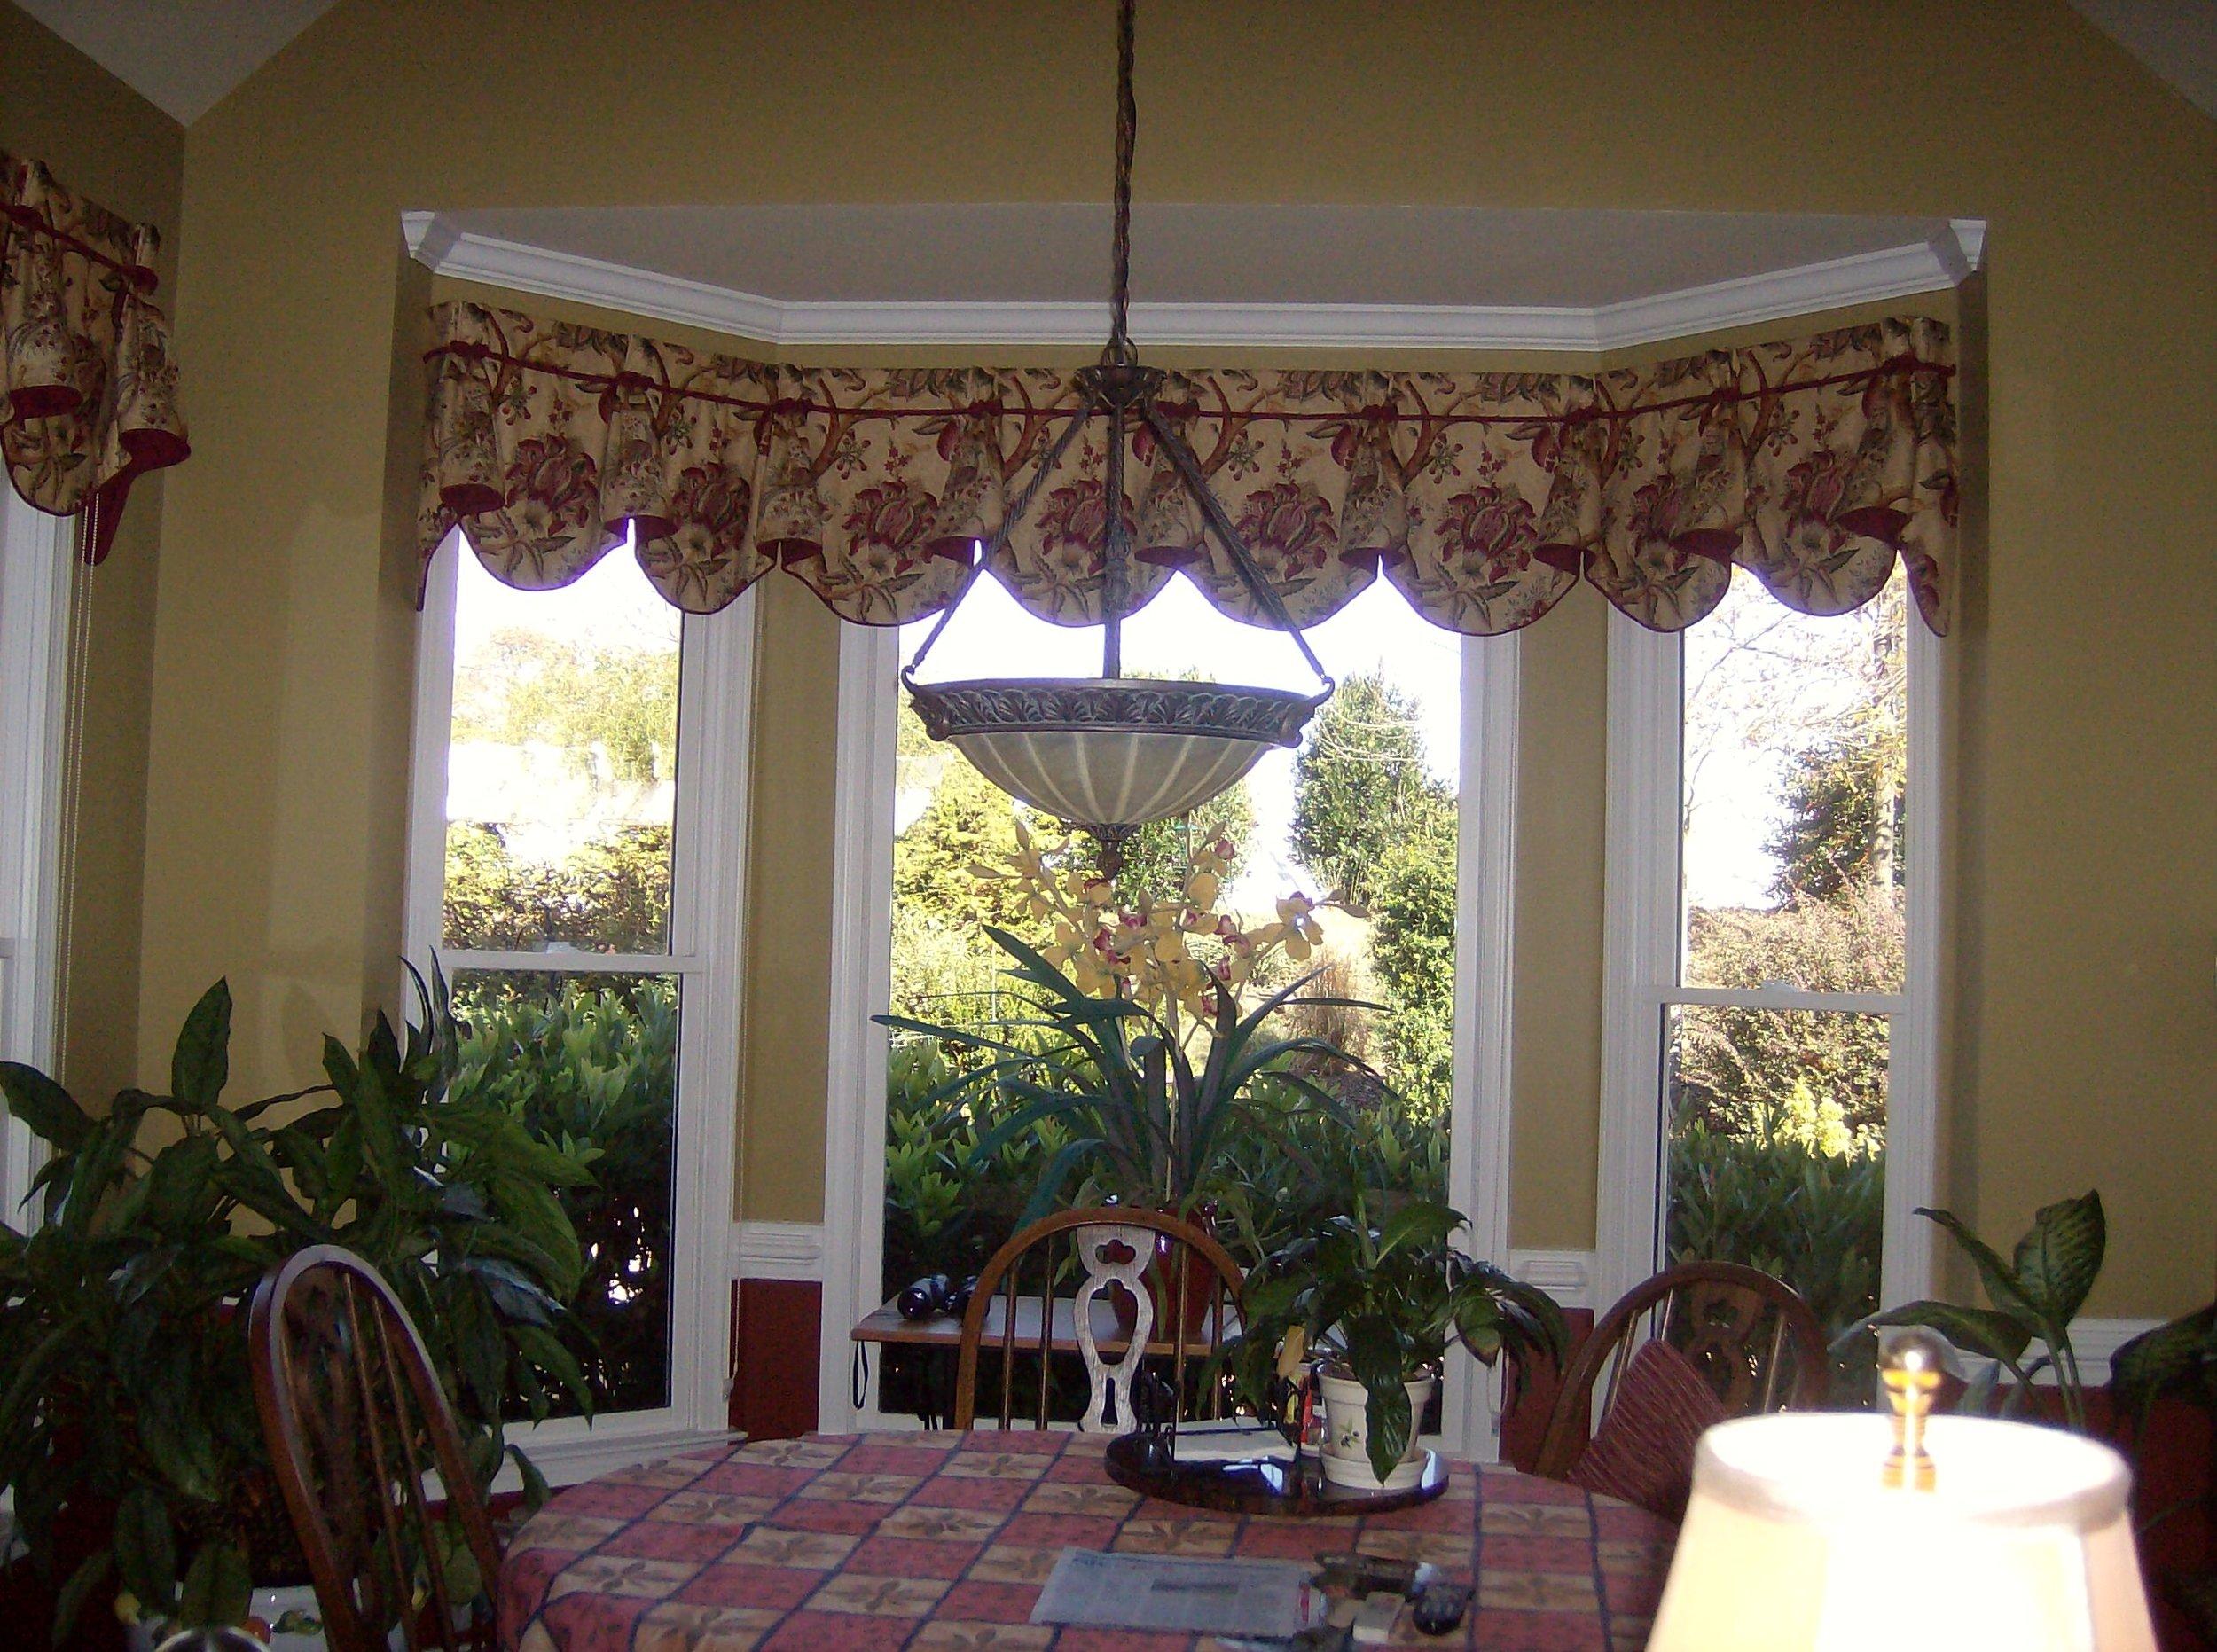 custom-blinds-drapery-shades-interior-design-atlanta-georgia-15.JPG